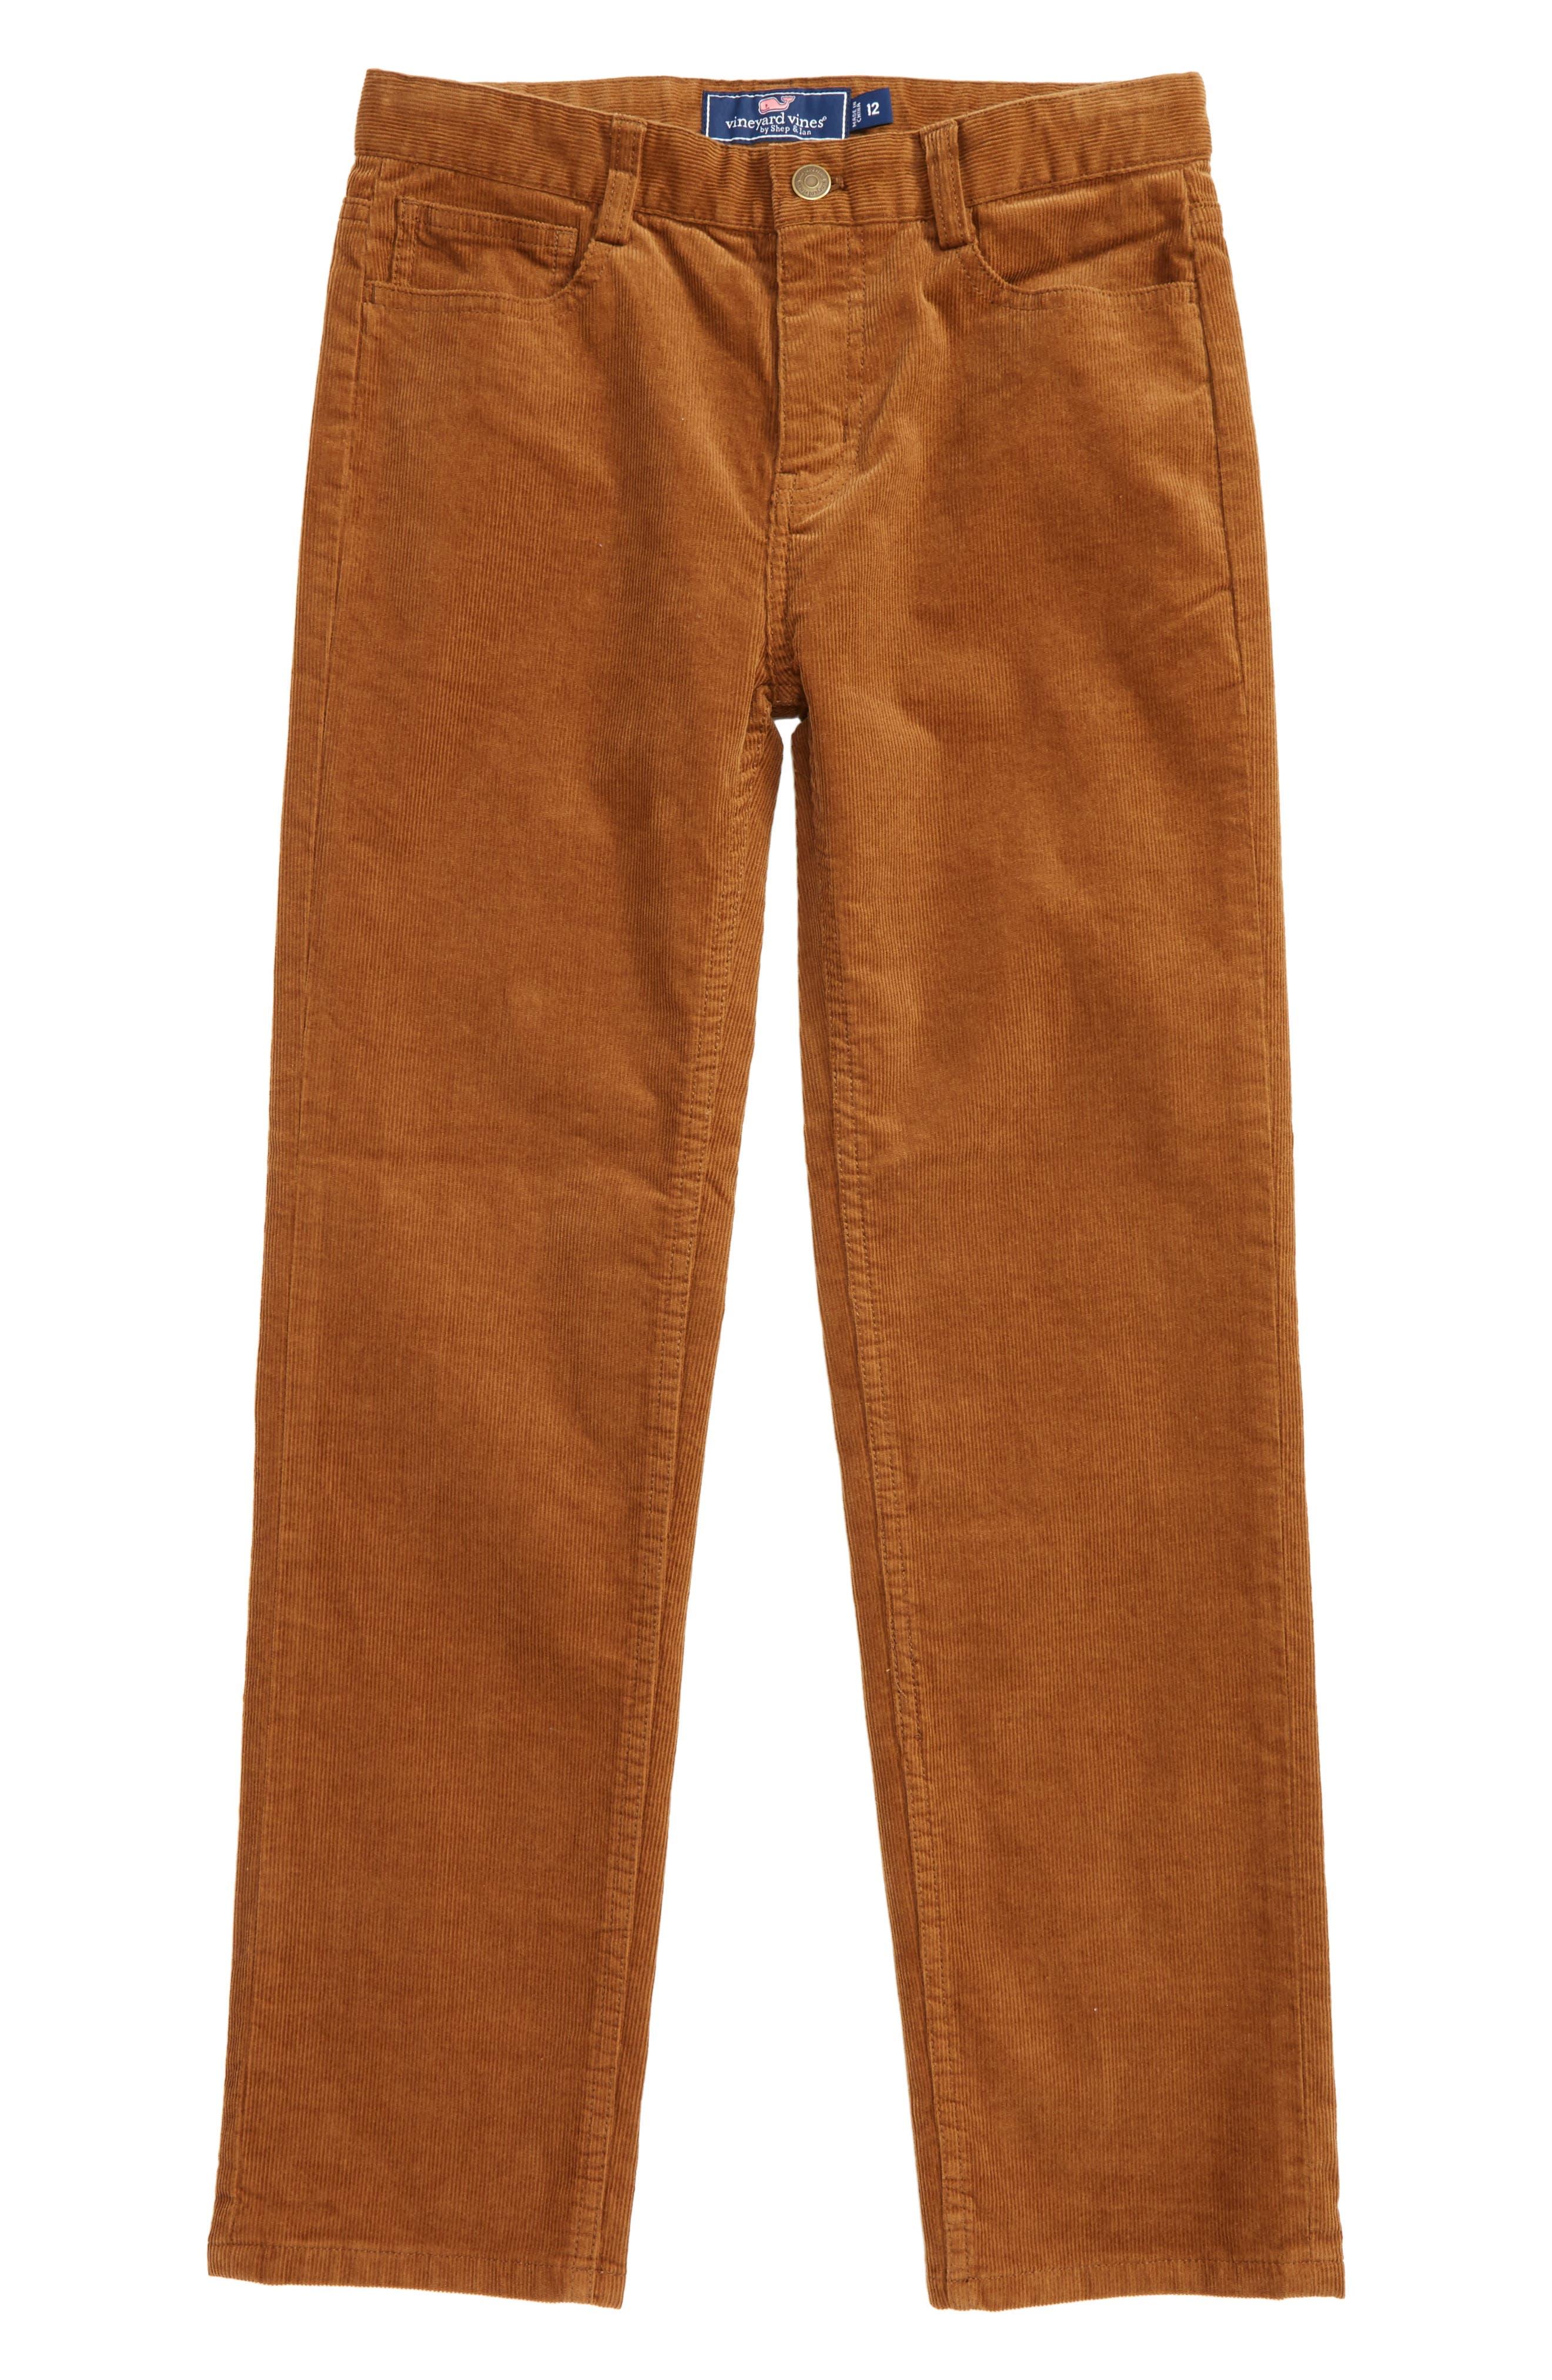 Alternate Image 1 Selected - vineyard vines Straight Leg Corduroy Pants (Big Boys)